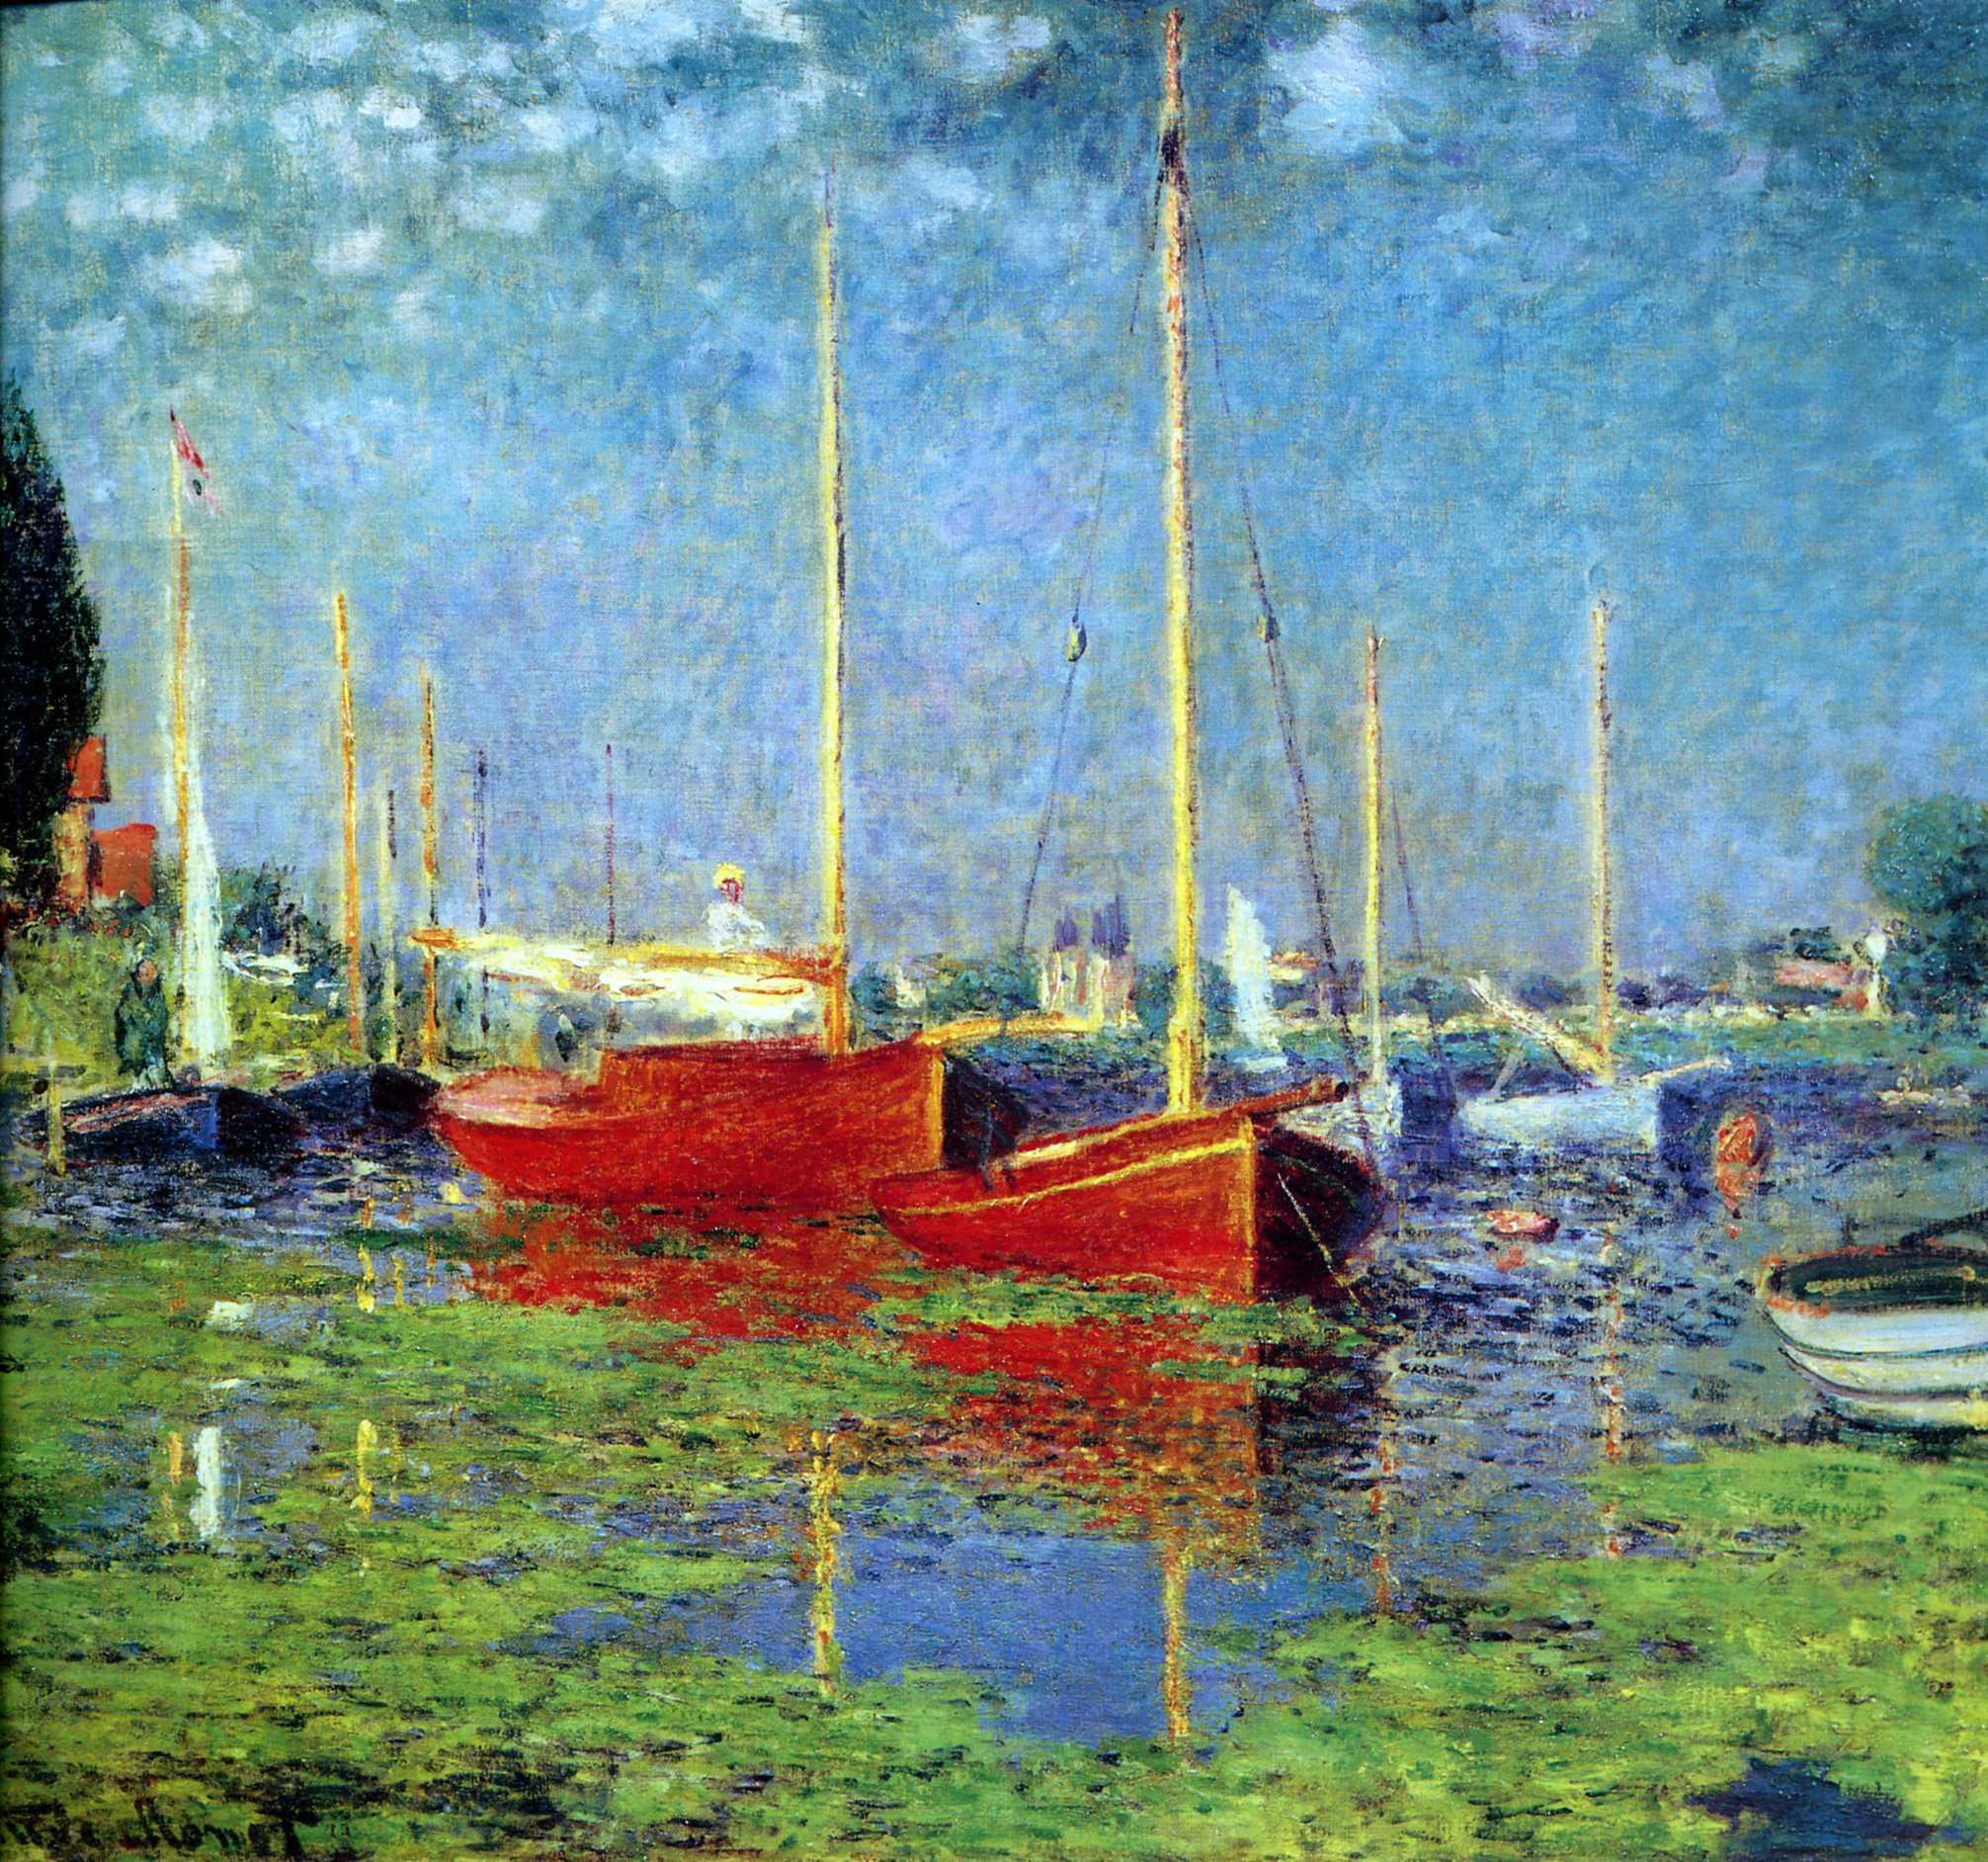 ������� - ��������� � ����� < ����������� ����� � ������� >:: ���� ����, �������� ������� - ���� ���� (Claude Monet) ����